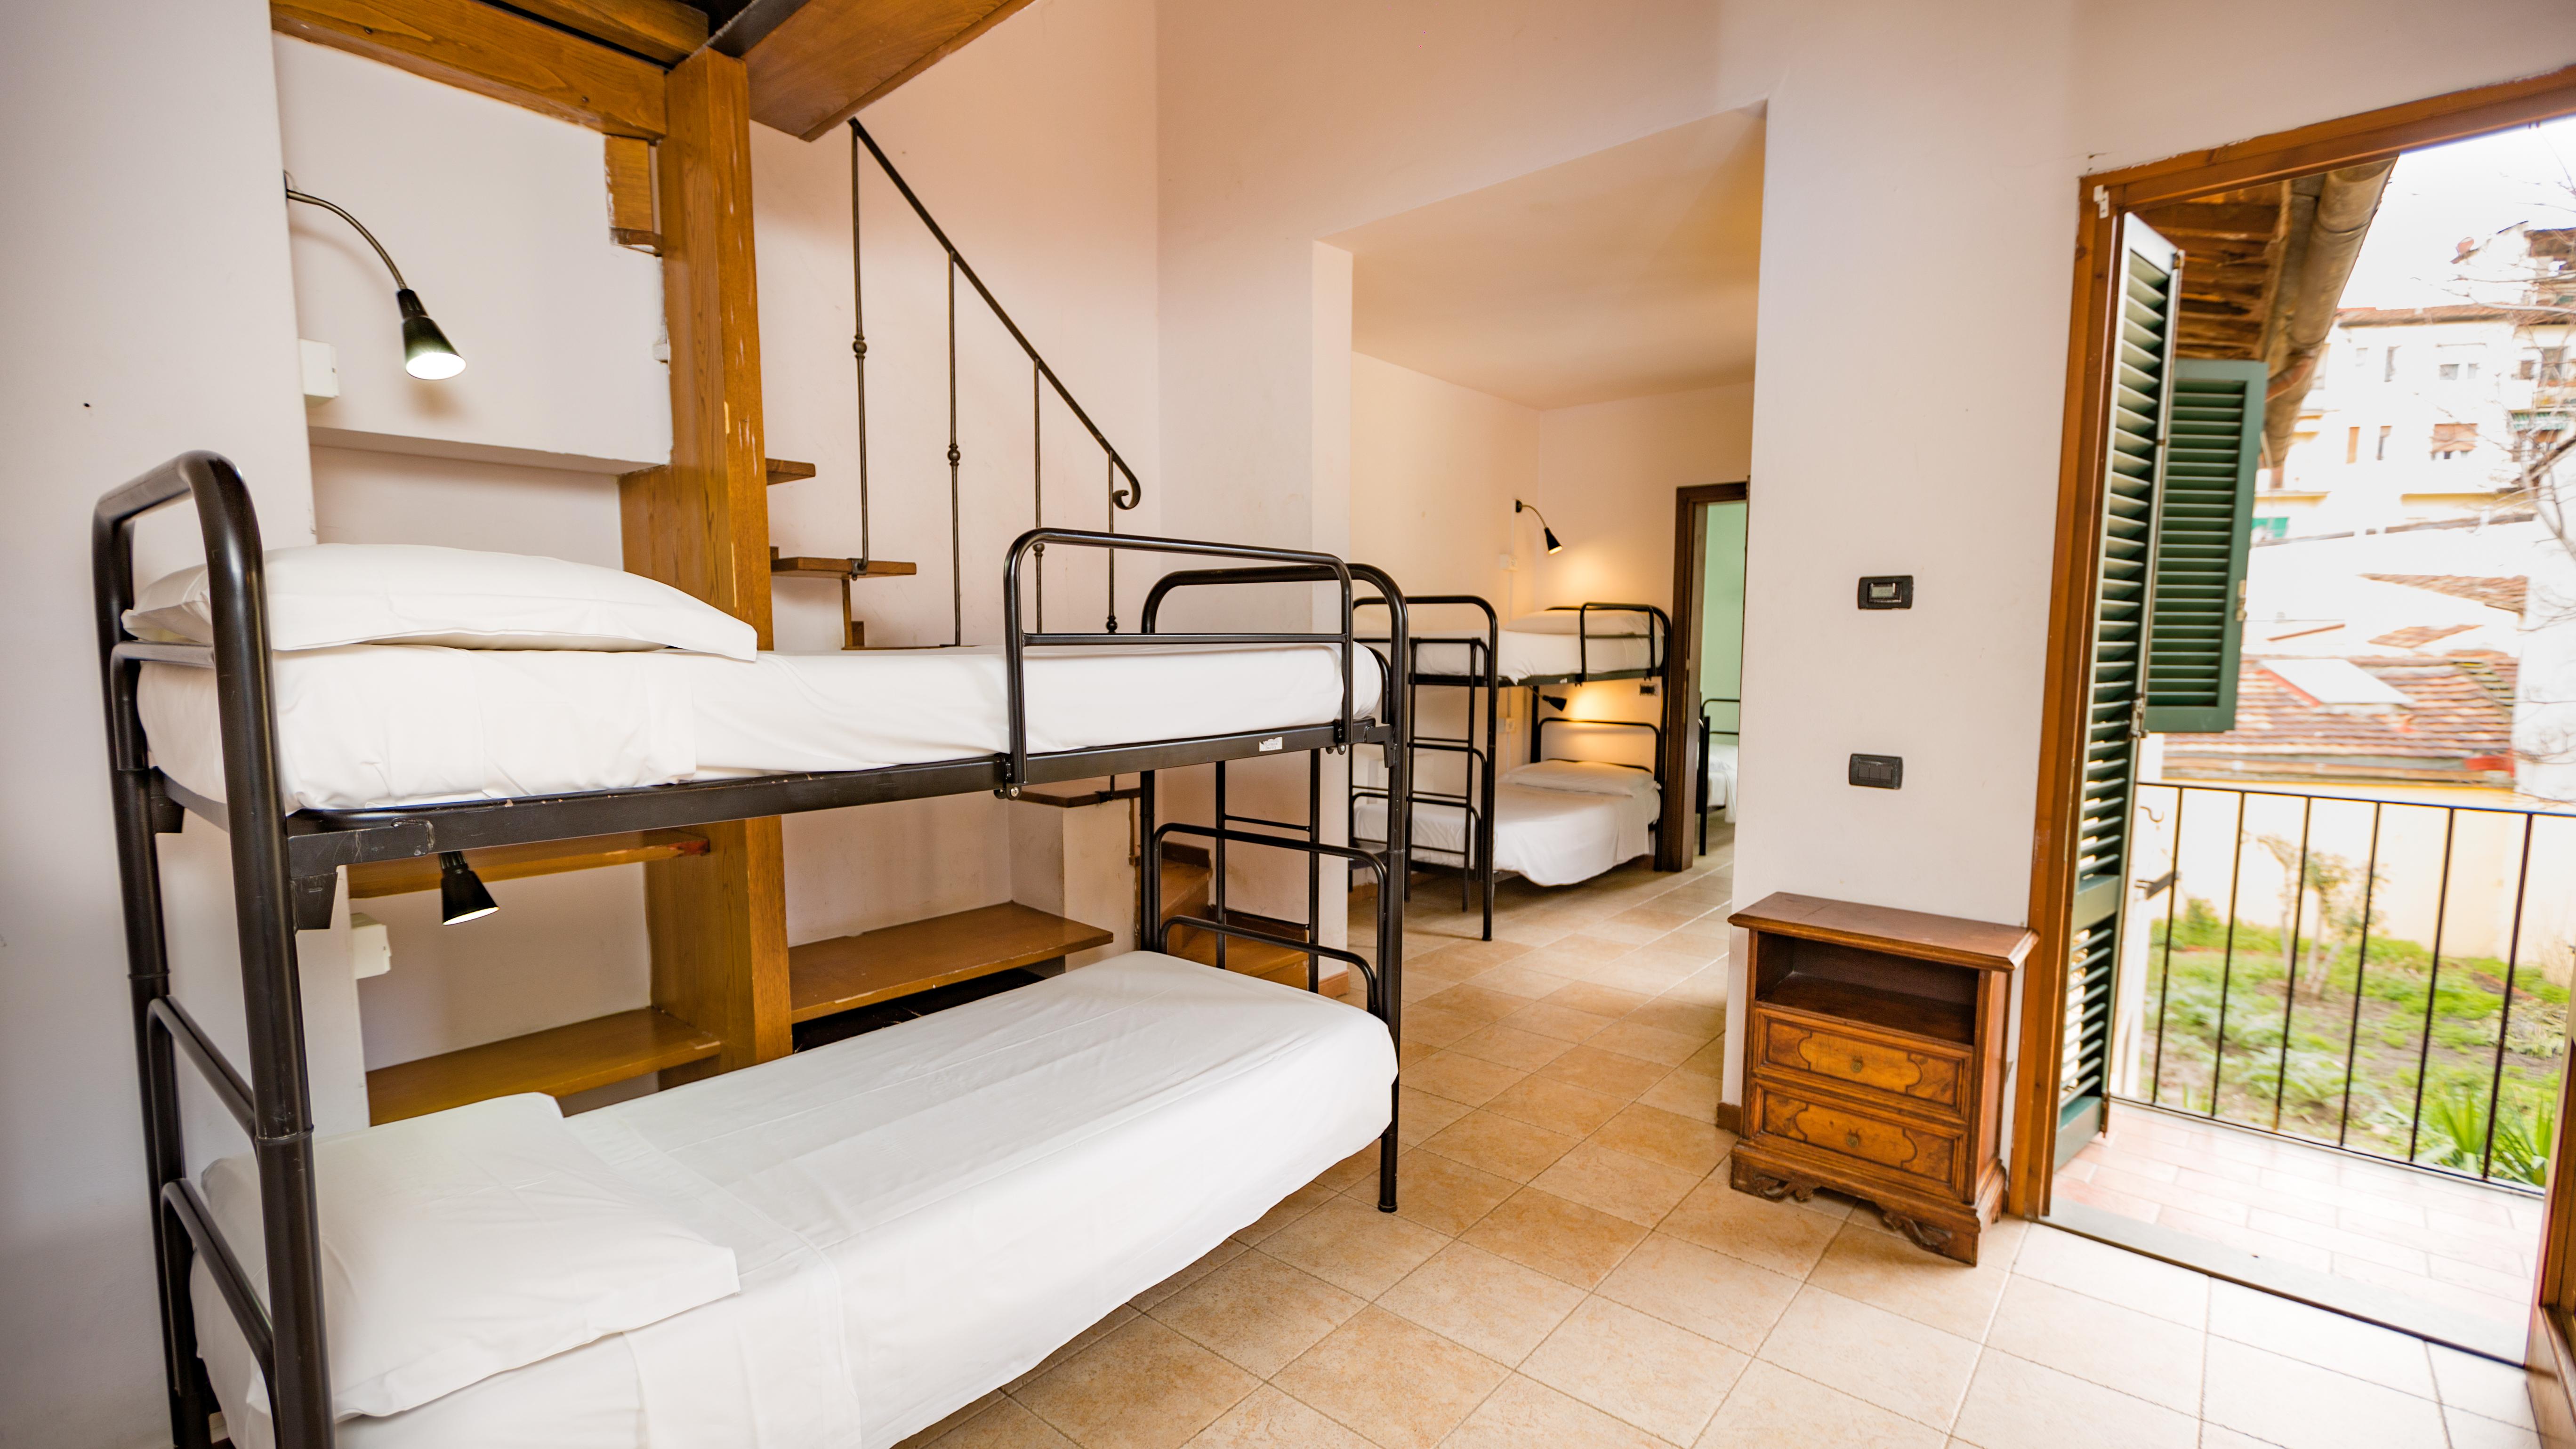 HOSTEL - New Hostel Florence